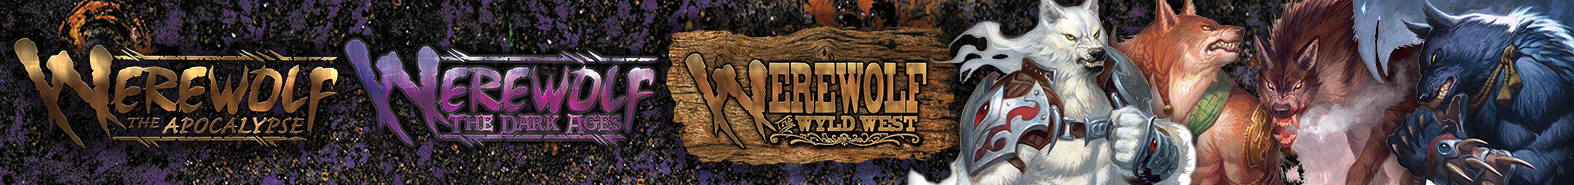 Werewolf the Apocolypse @ Storytellers Vault